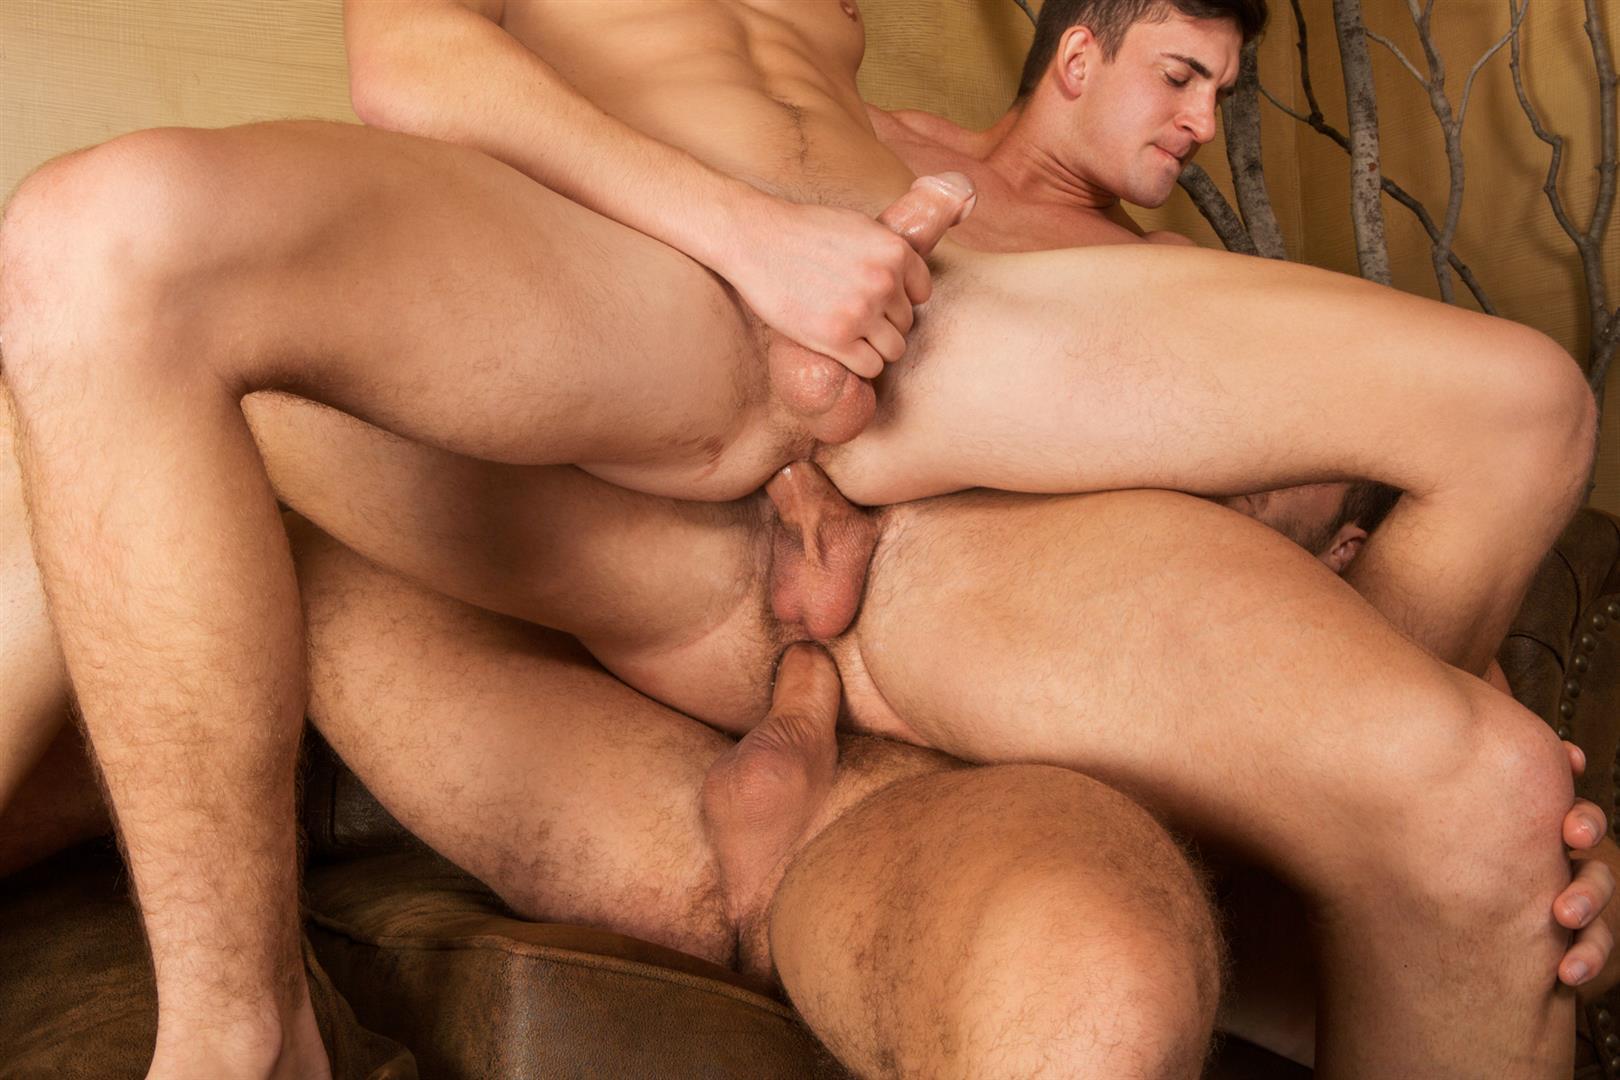 Sean-Cody-Winter-Getaway-Day-2-Big-Dick-Hunks-Fucking-Bareback-Amateur-Gay-Porn-24 Sean Cody Takes The Boys On A 8-Day Bareback Winter Getaway